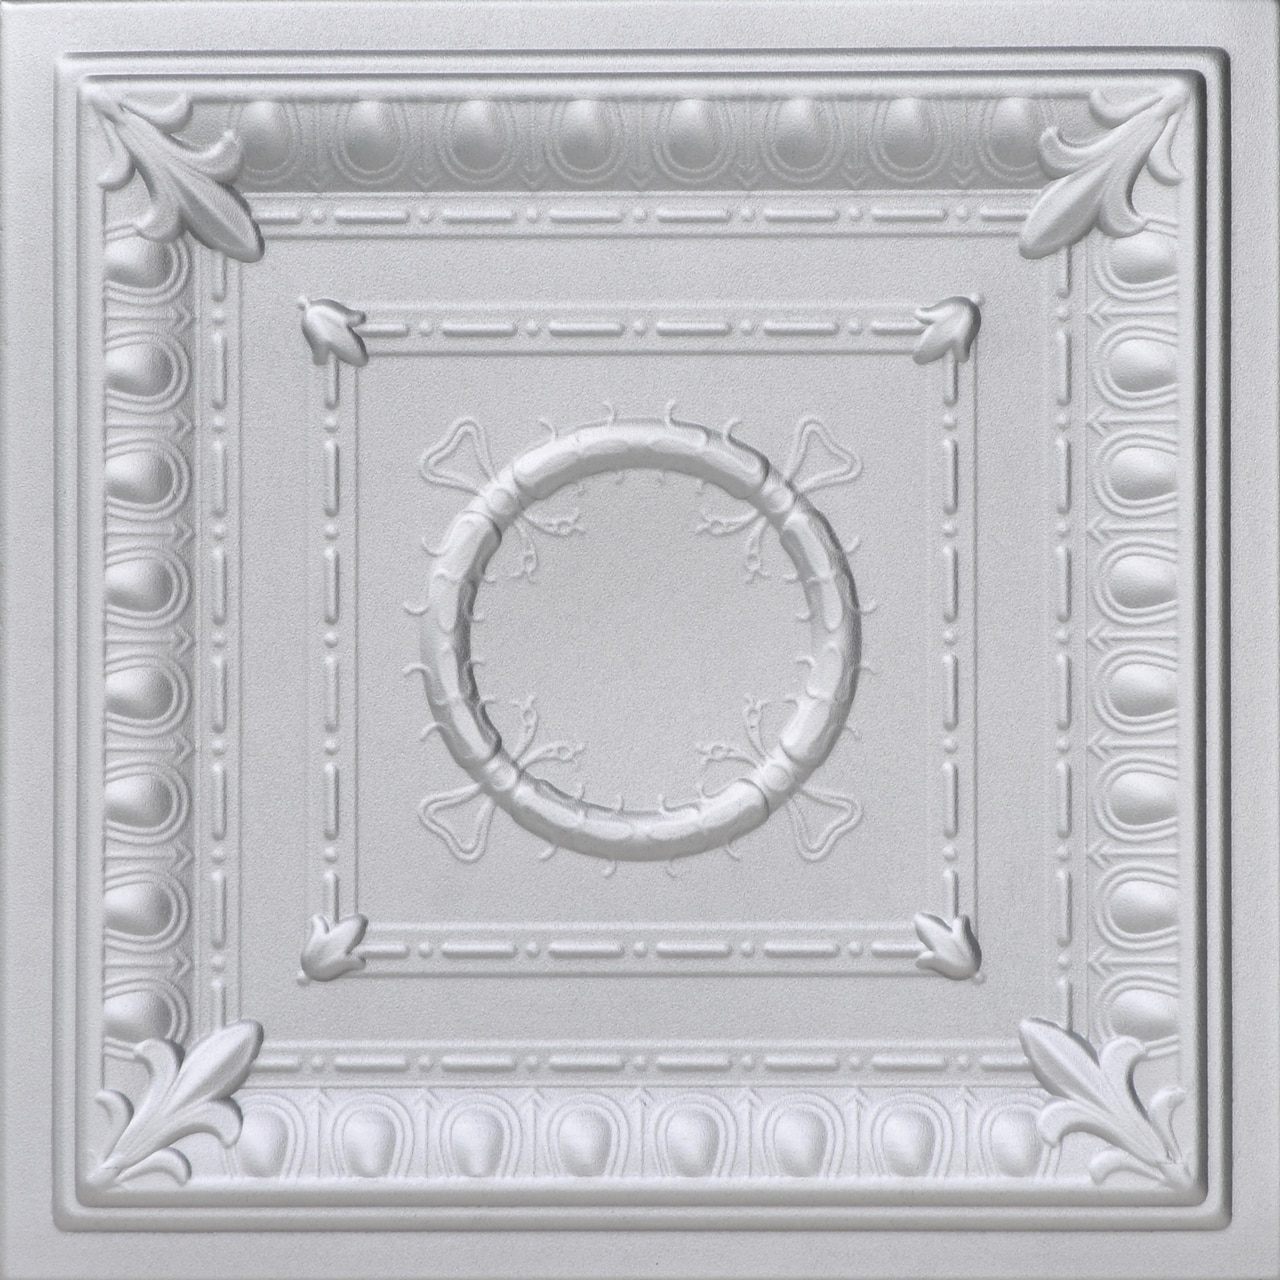 Romanesque Wreath Glue-up Styrofoam Ceiling Tile 20 in x 20 in - #R 47